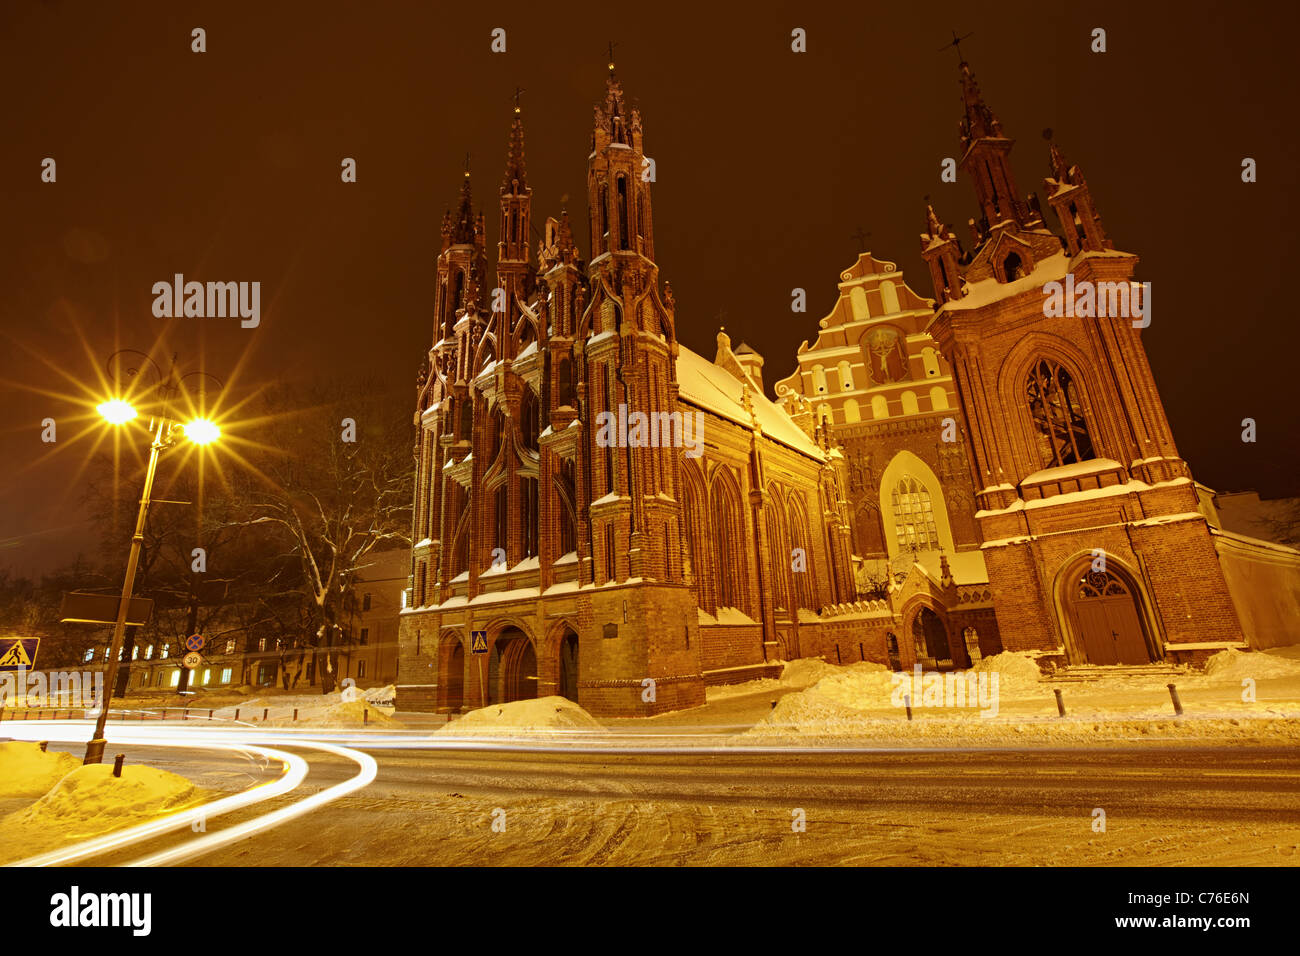 St. Anne's Church in the night, Vilnius Stock Photo